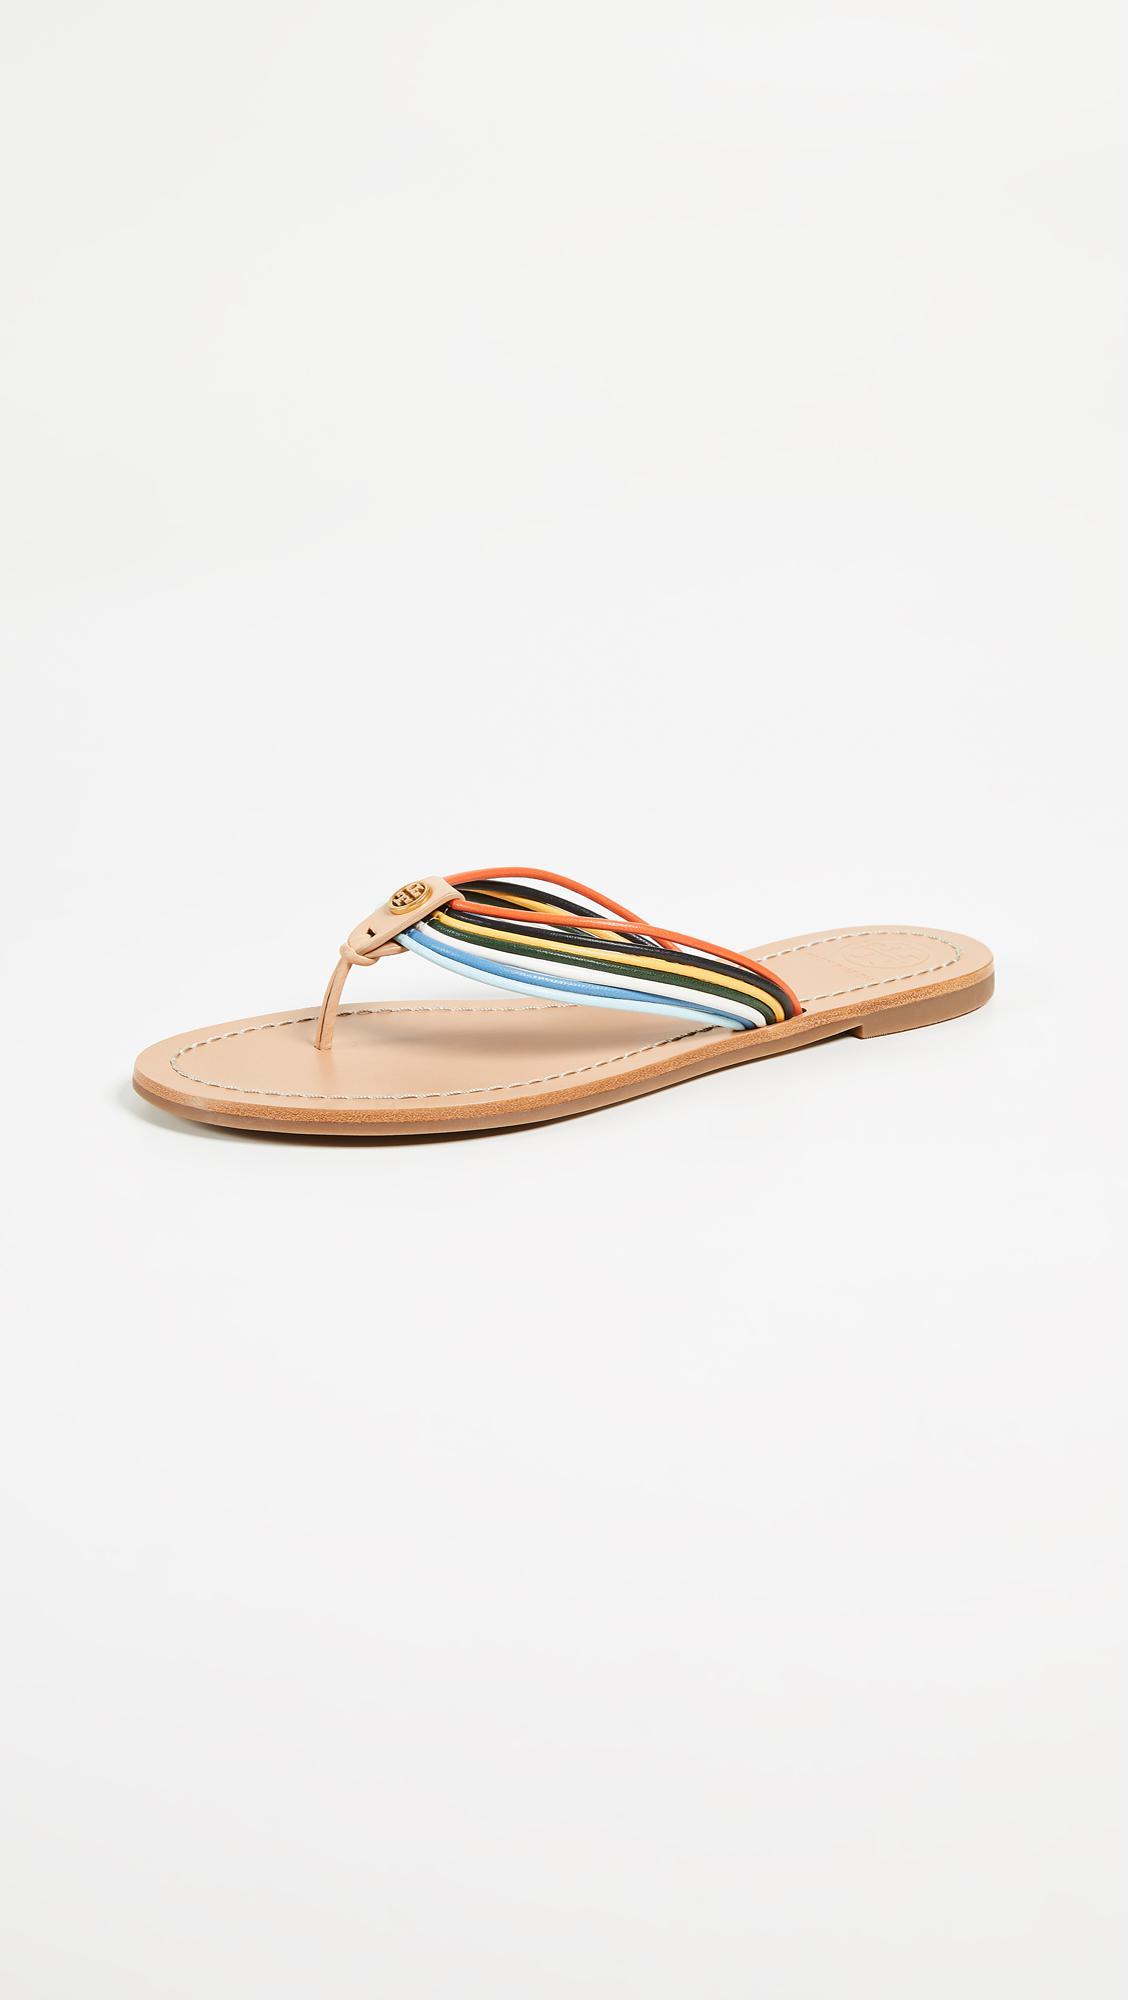 6e1c993bf189 Lyst - Tory Burch Sienna Thong Sandals